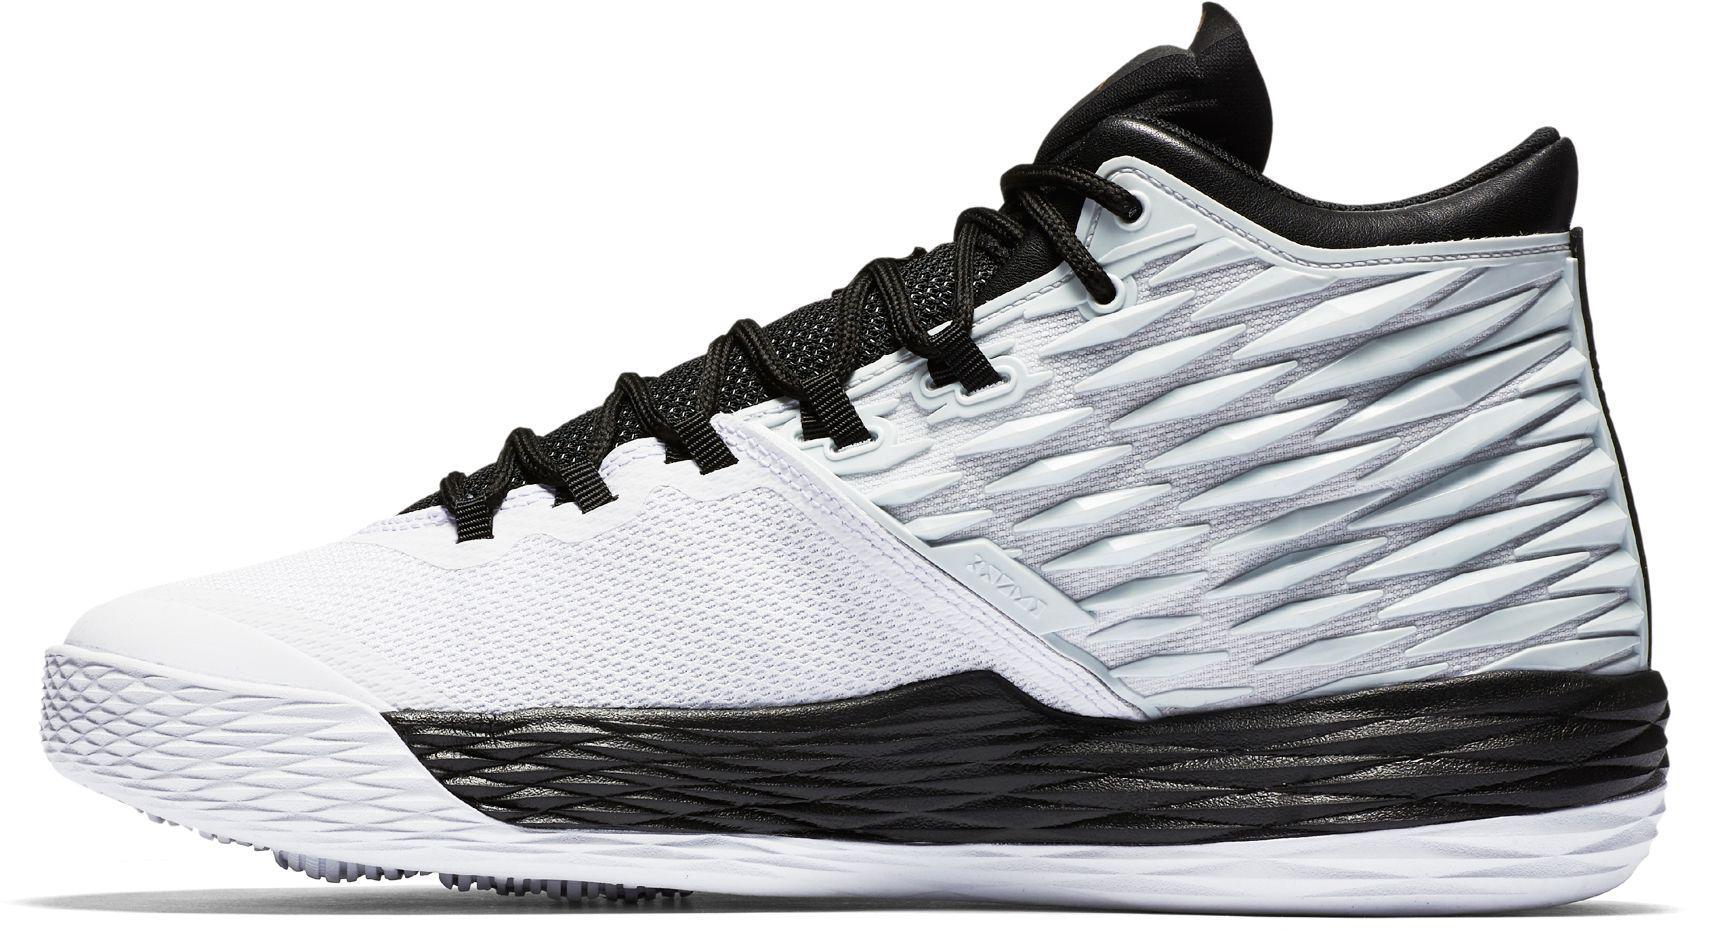 pretty nice 94b0a ca916 Nike - Black Melo M13 Basketball Shoes for Men - Lyst